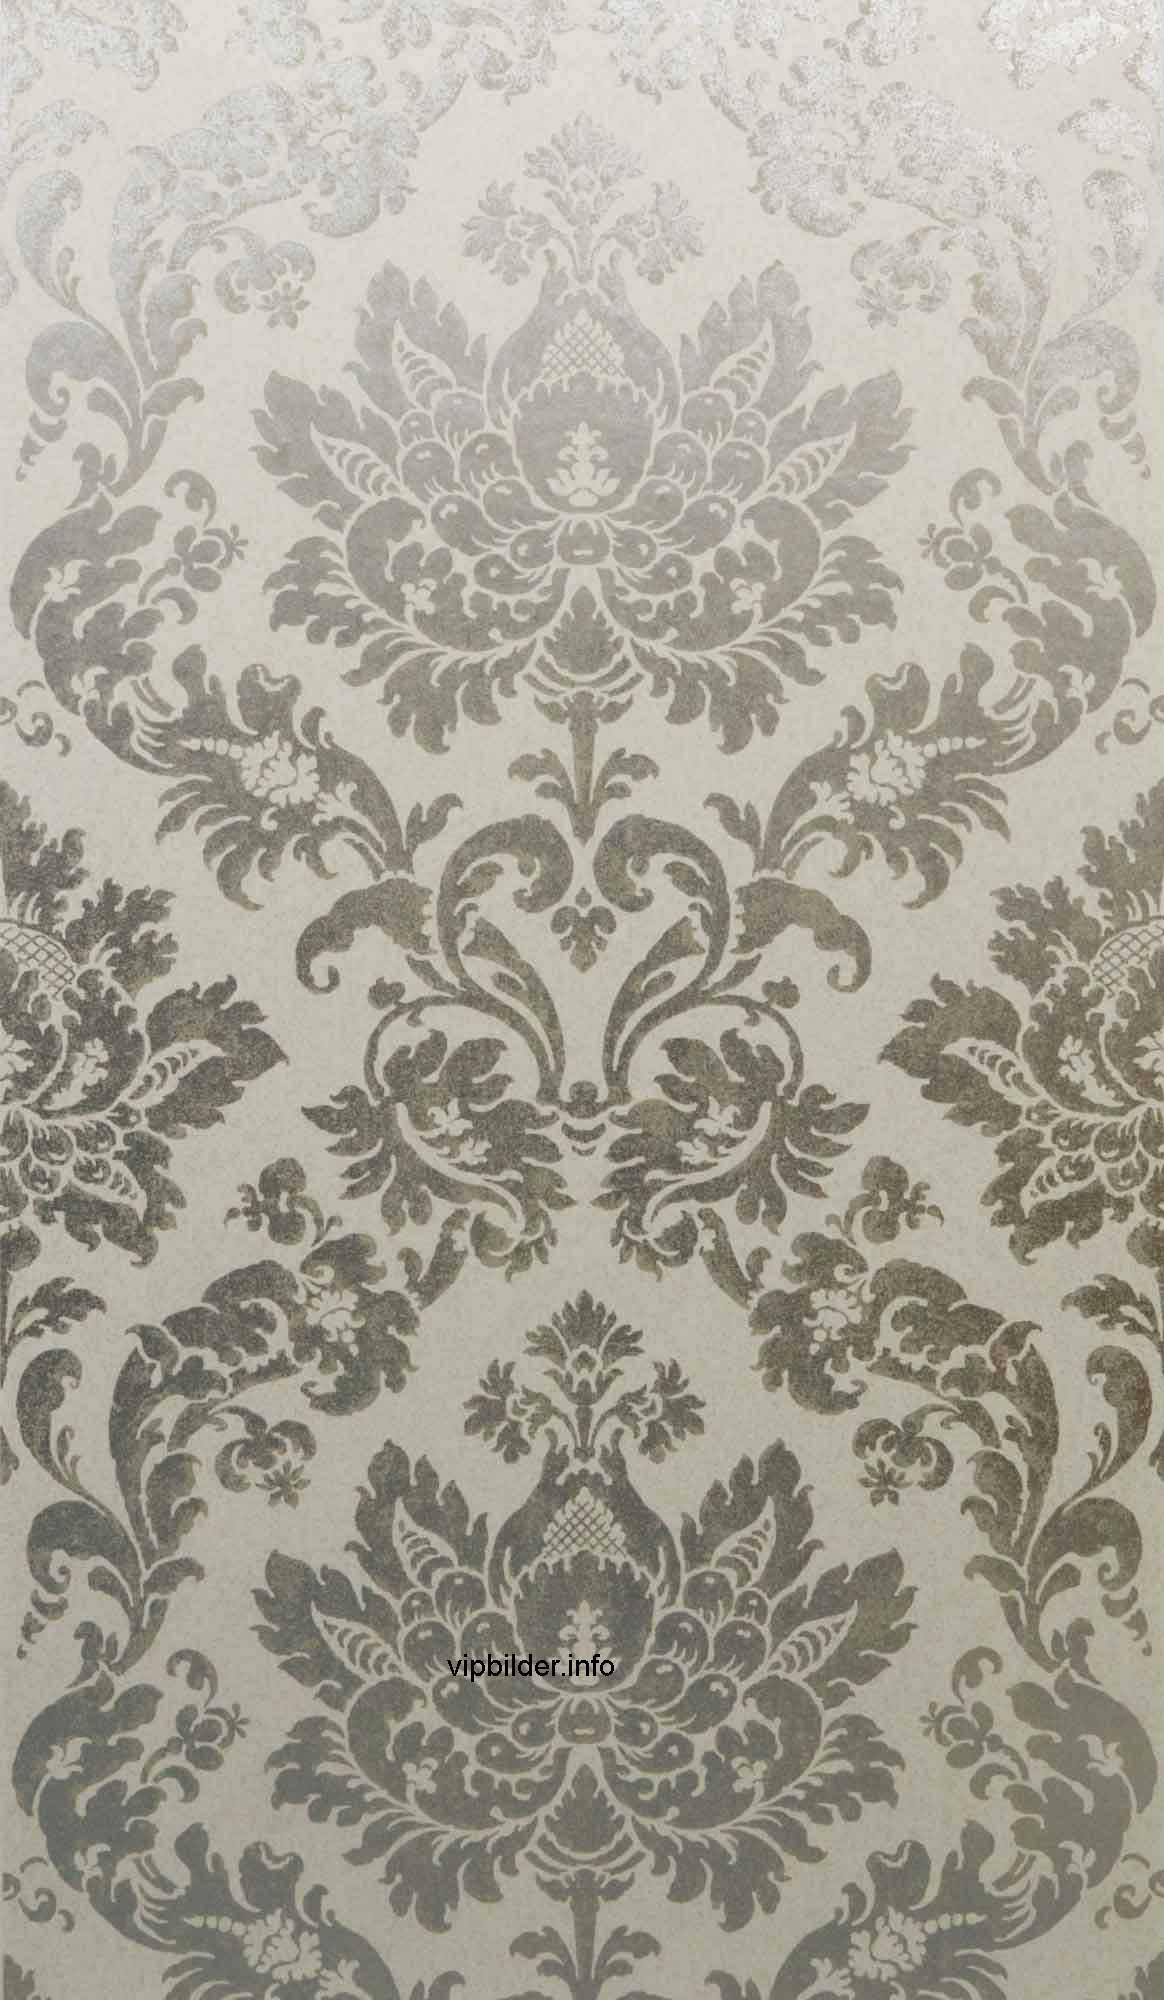 luxus tapeten omexco palazzo im klassischem barock stil. Black Bedroom Furniture Sets. Home Design Ideas